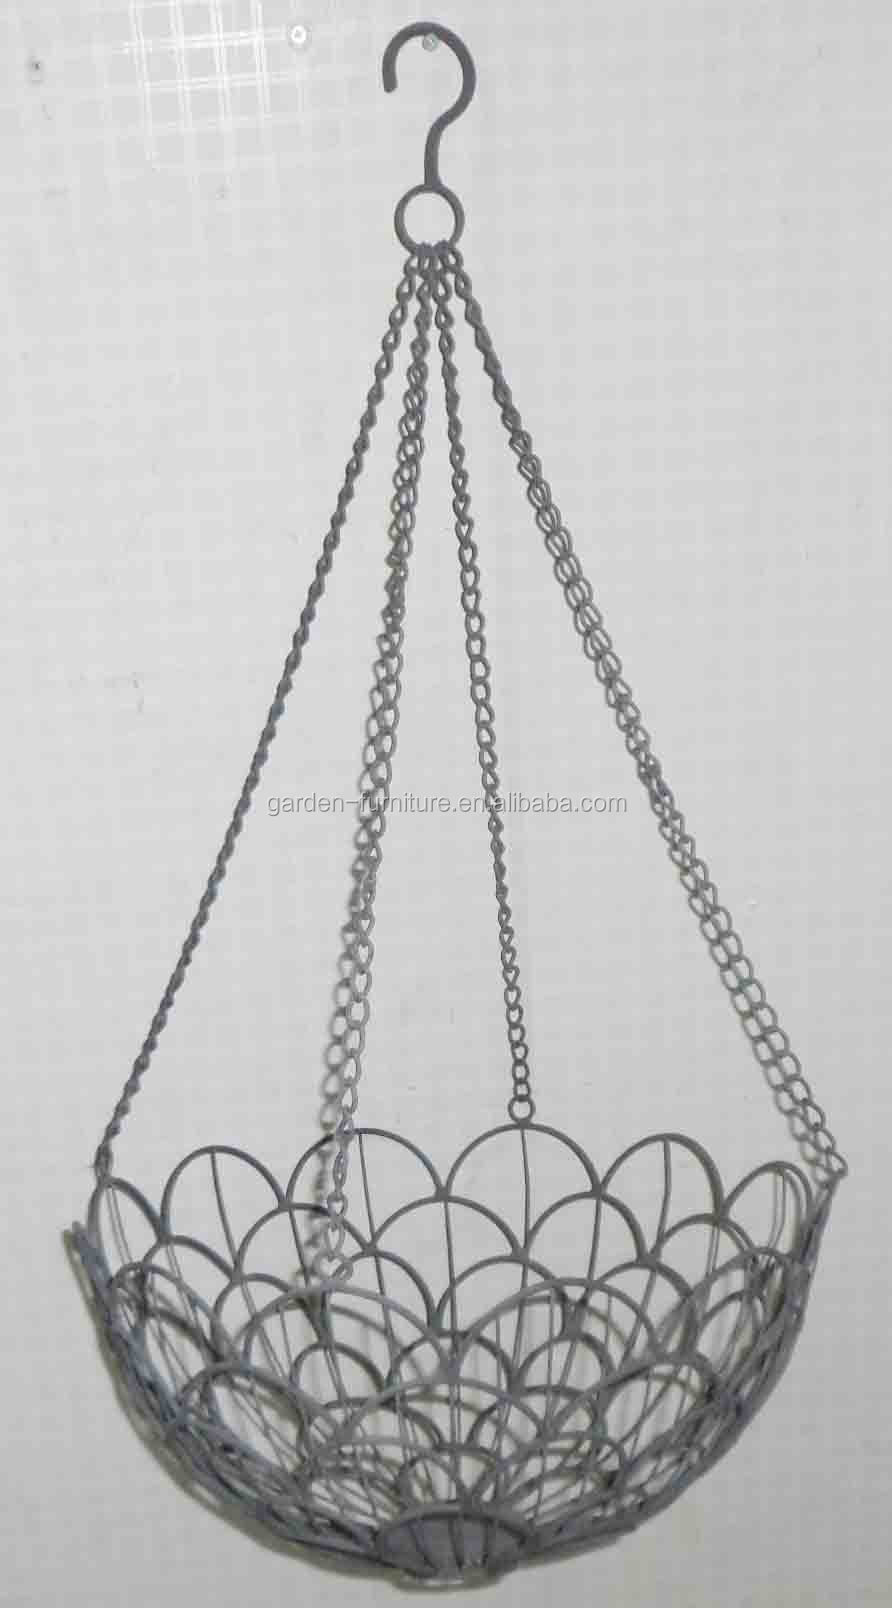 Handicraft Decorative Metal Planter Fruit Bowl Wrought Iron Hanging ...